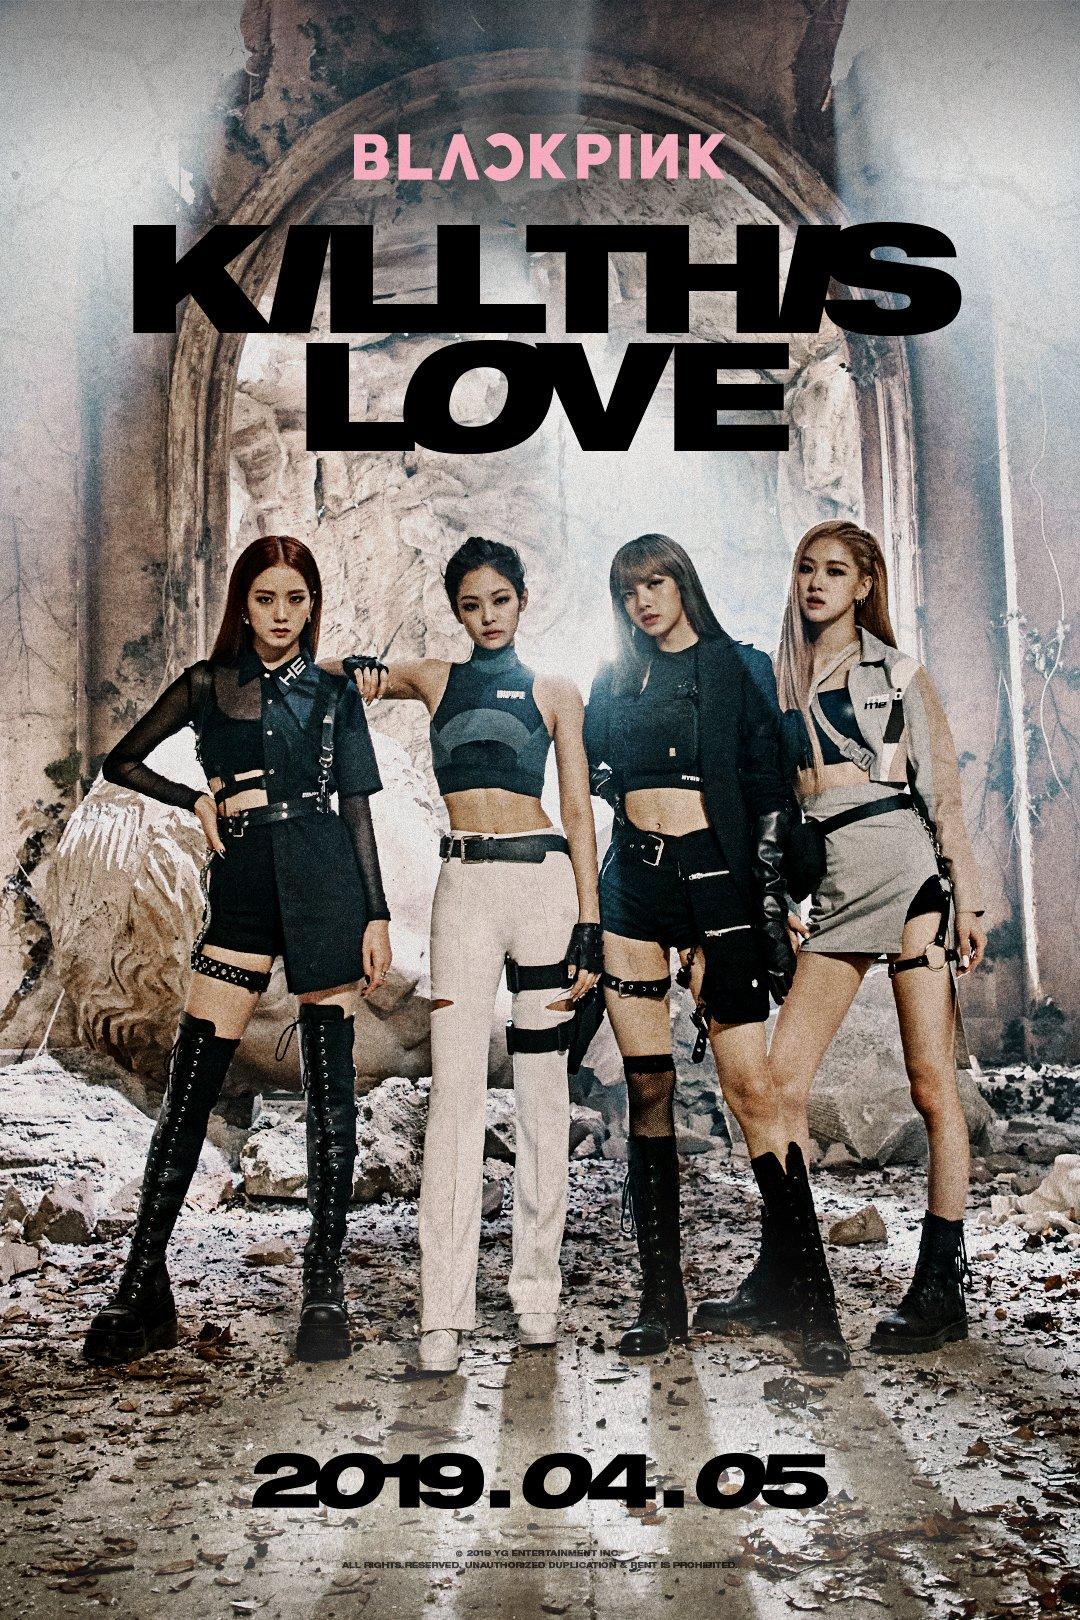 Blackpink – Kill This Love Teasers (Rose, Jisoo)